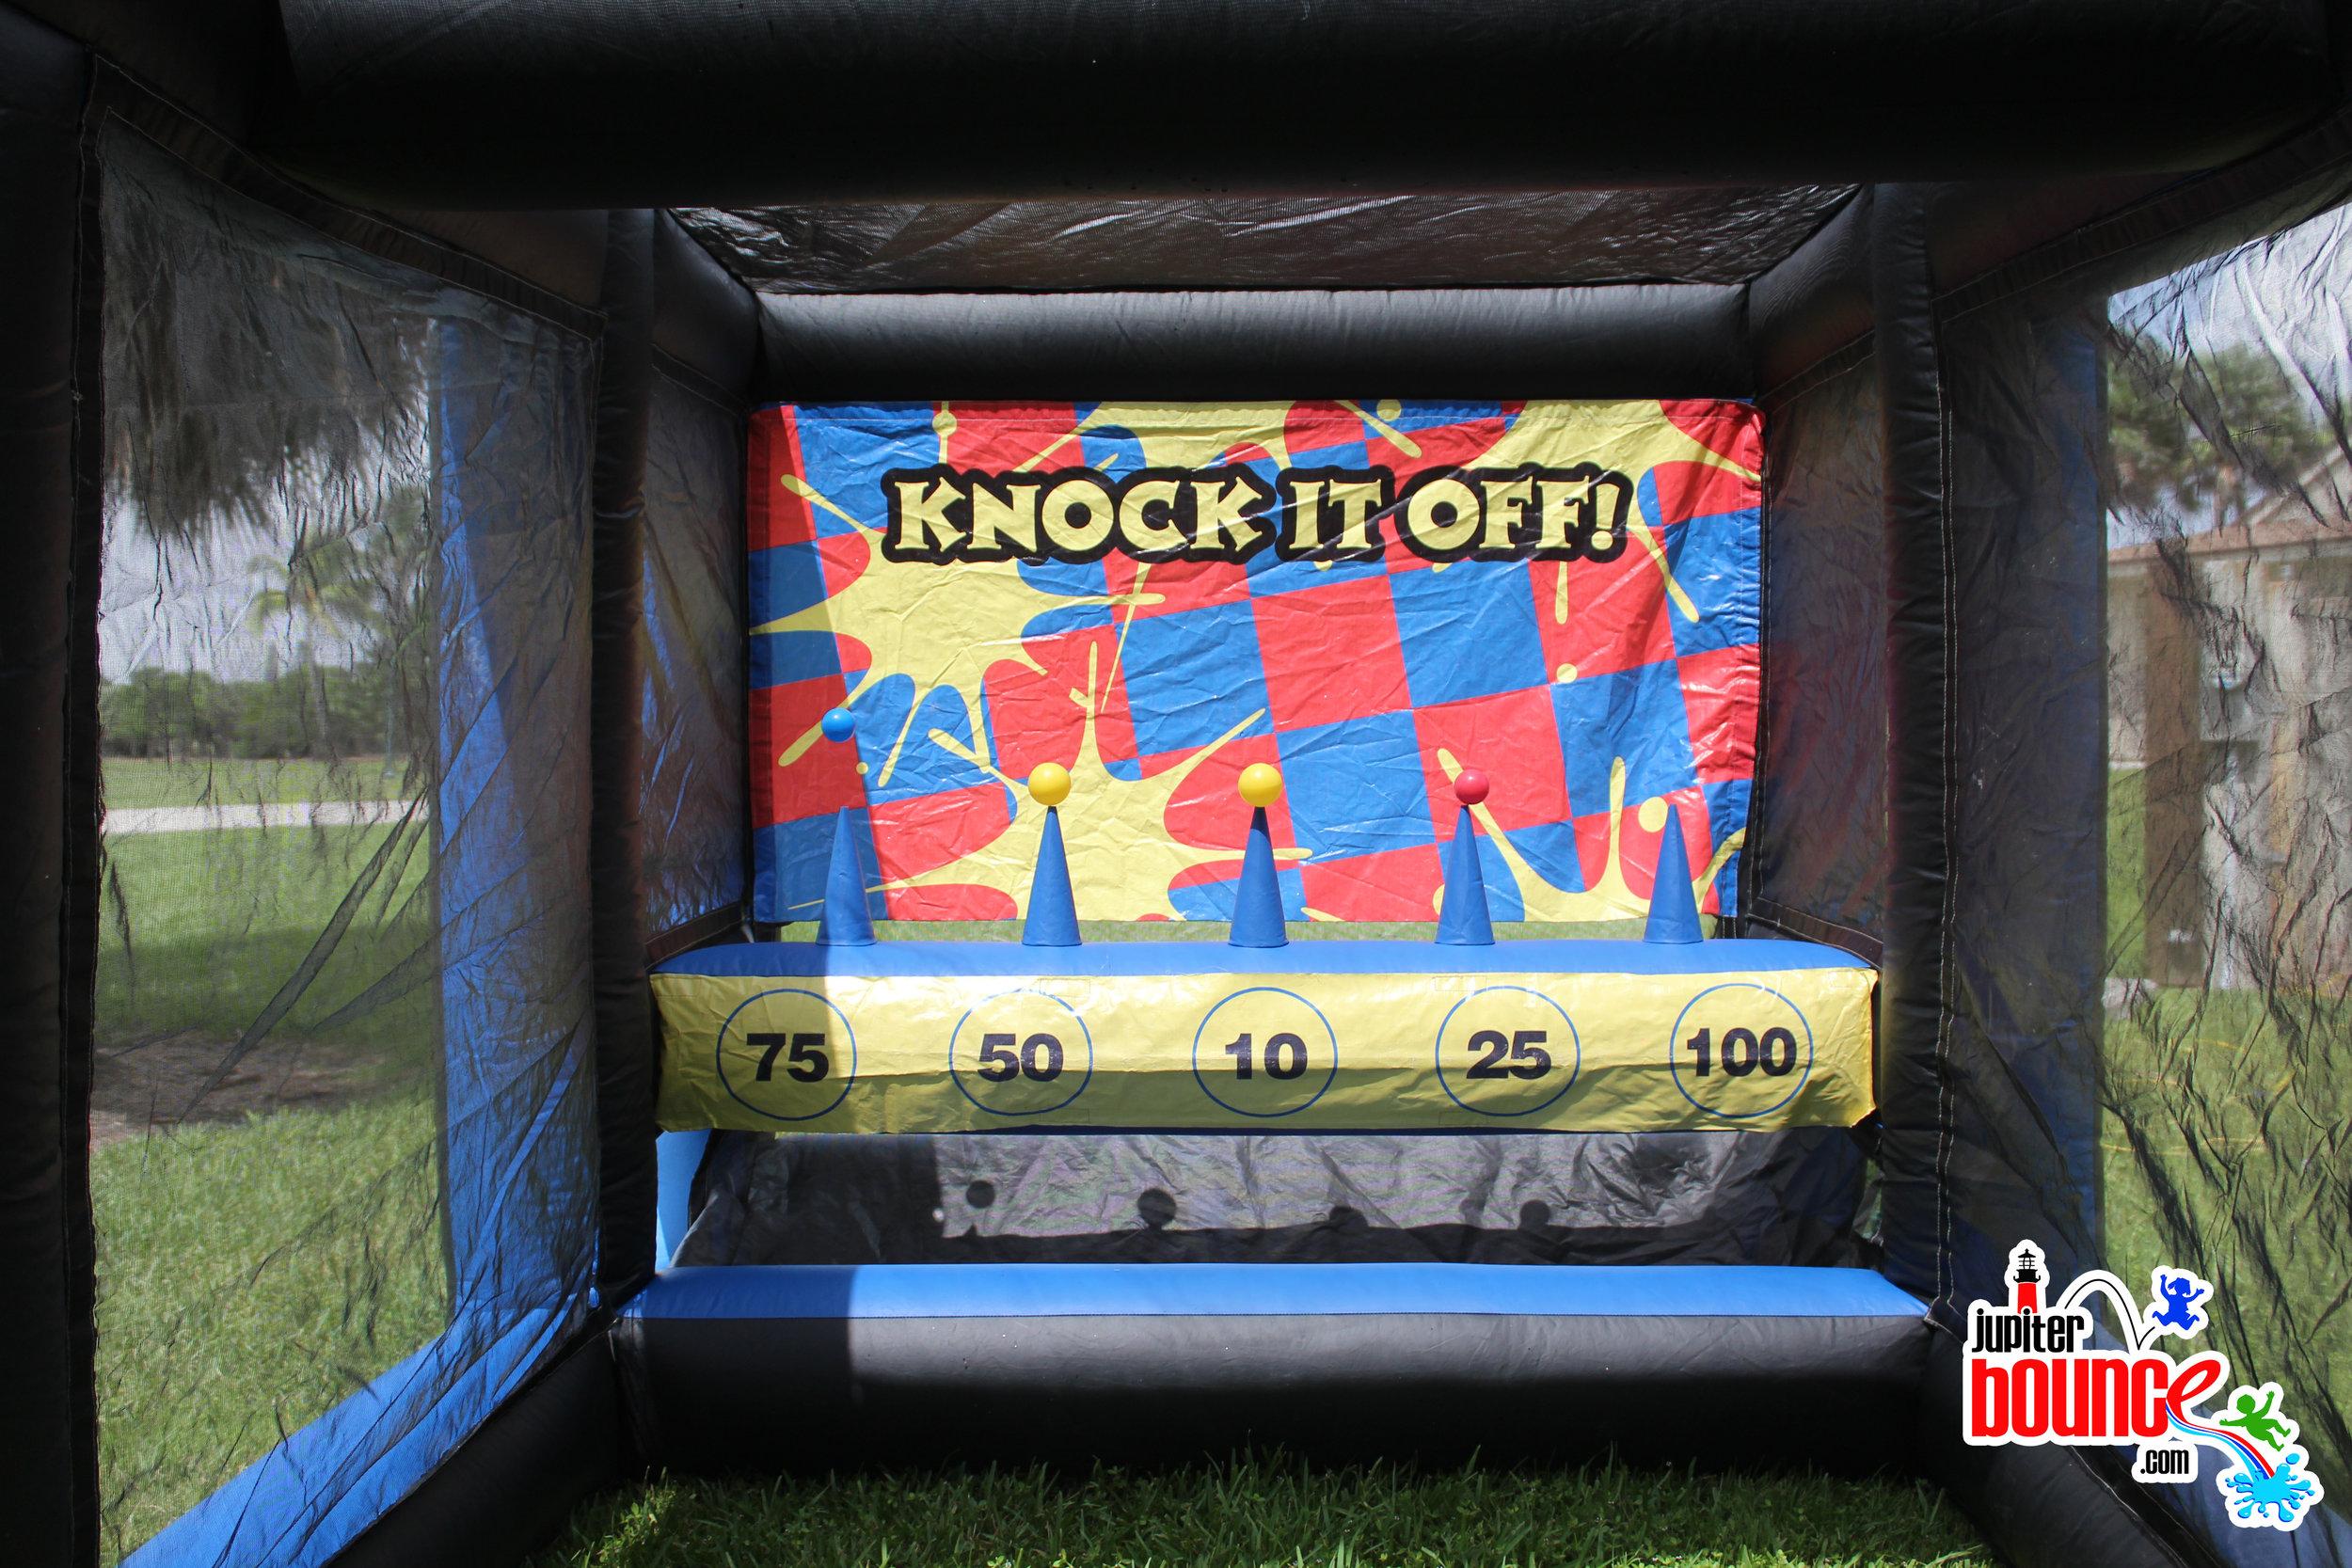 knockitoff-baseballgame-pitching-jupiterbounce-sportsgame-schoolcarnival-33458-palmbeachgardens-juplovin-tequesta-hobesound-stuart-facepainting-rockwall.jpg